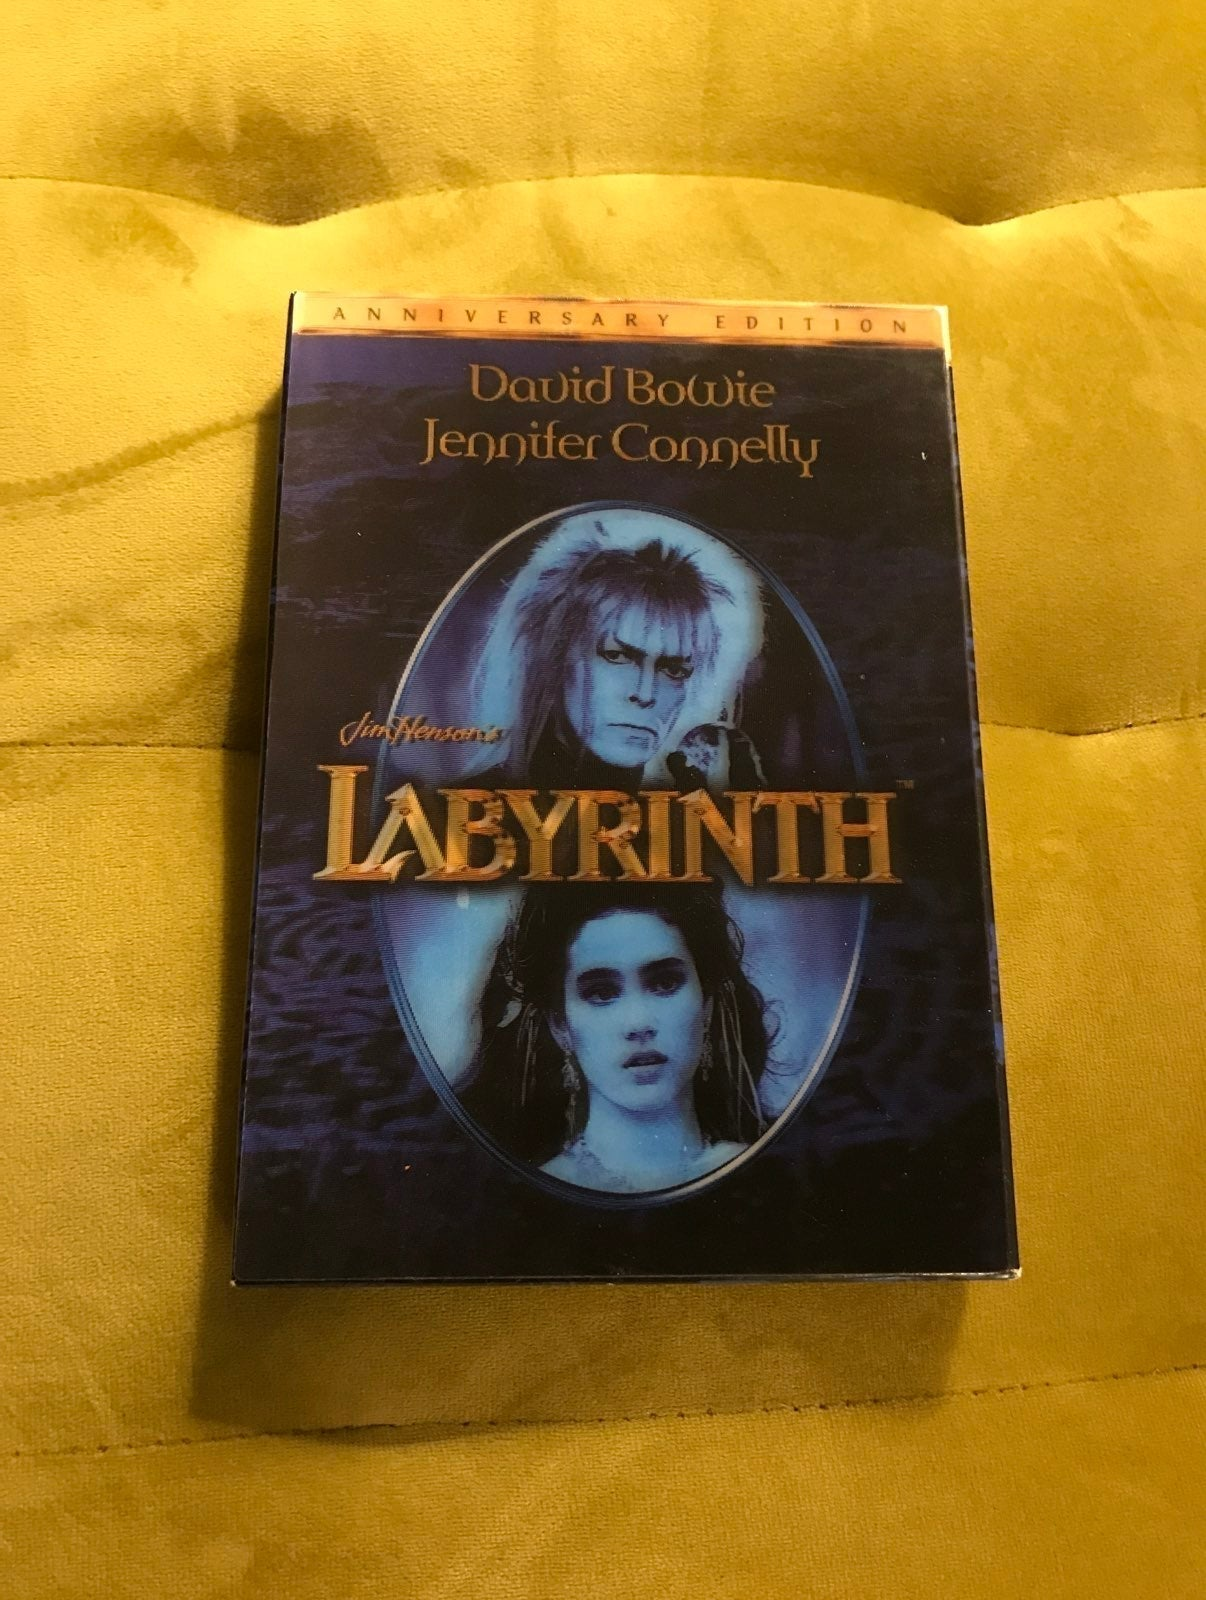 Labyrinth a Lucas-Henson-David Bowie DVD